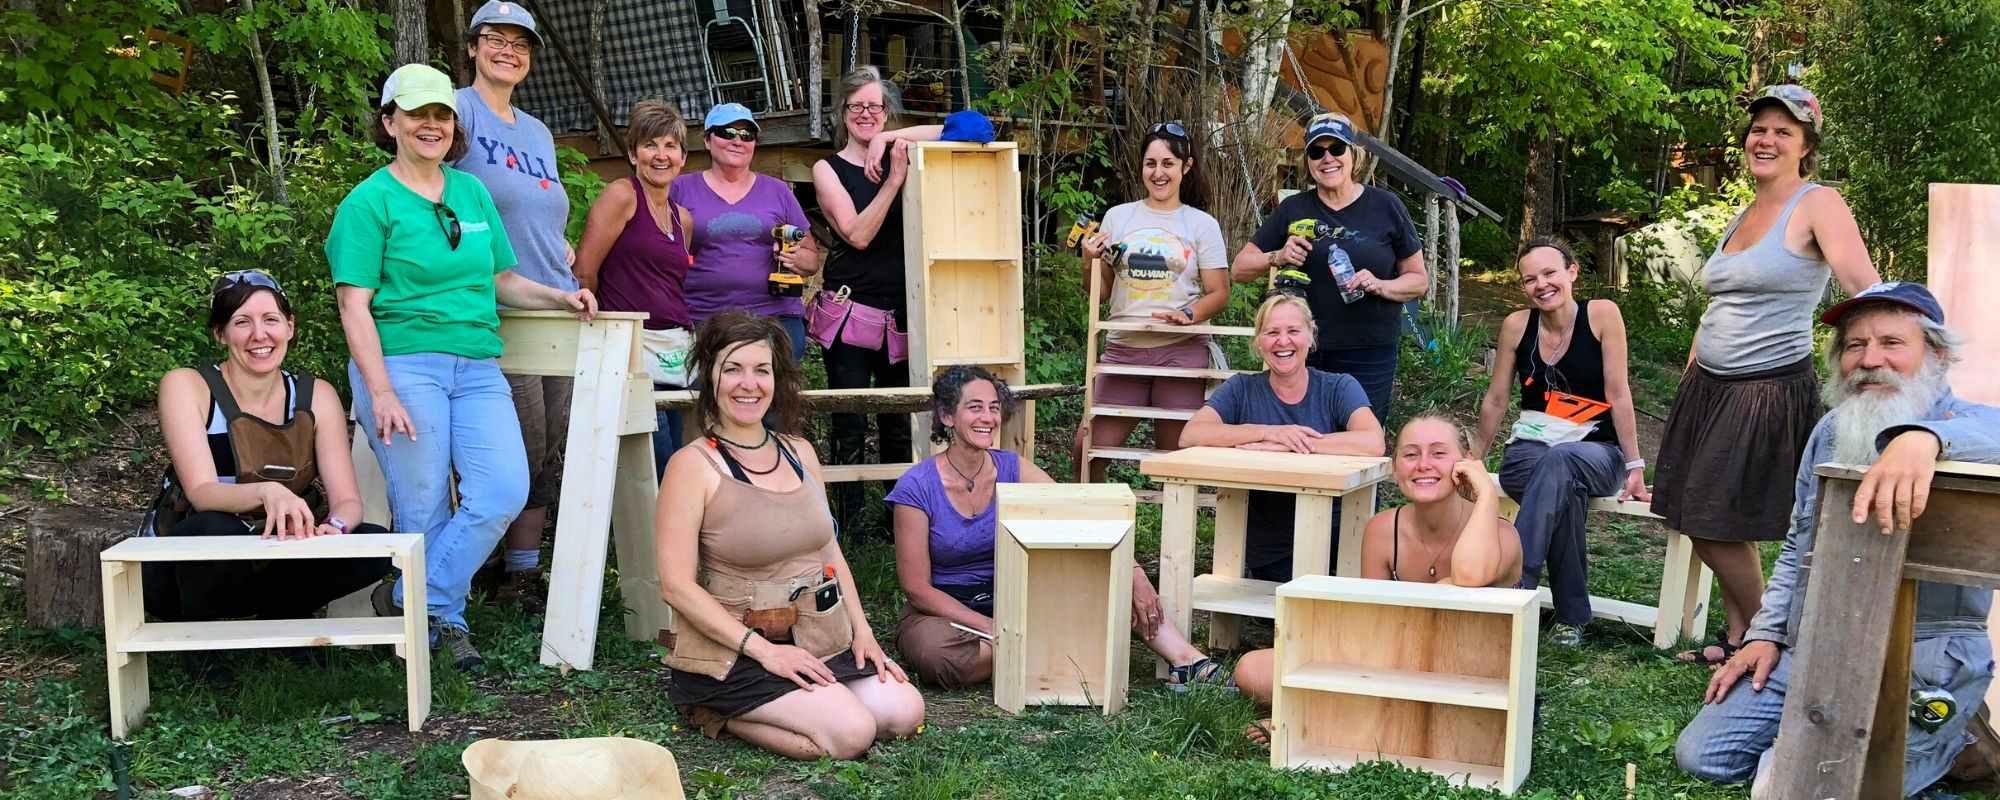 women's carpenty class, wild abundance